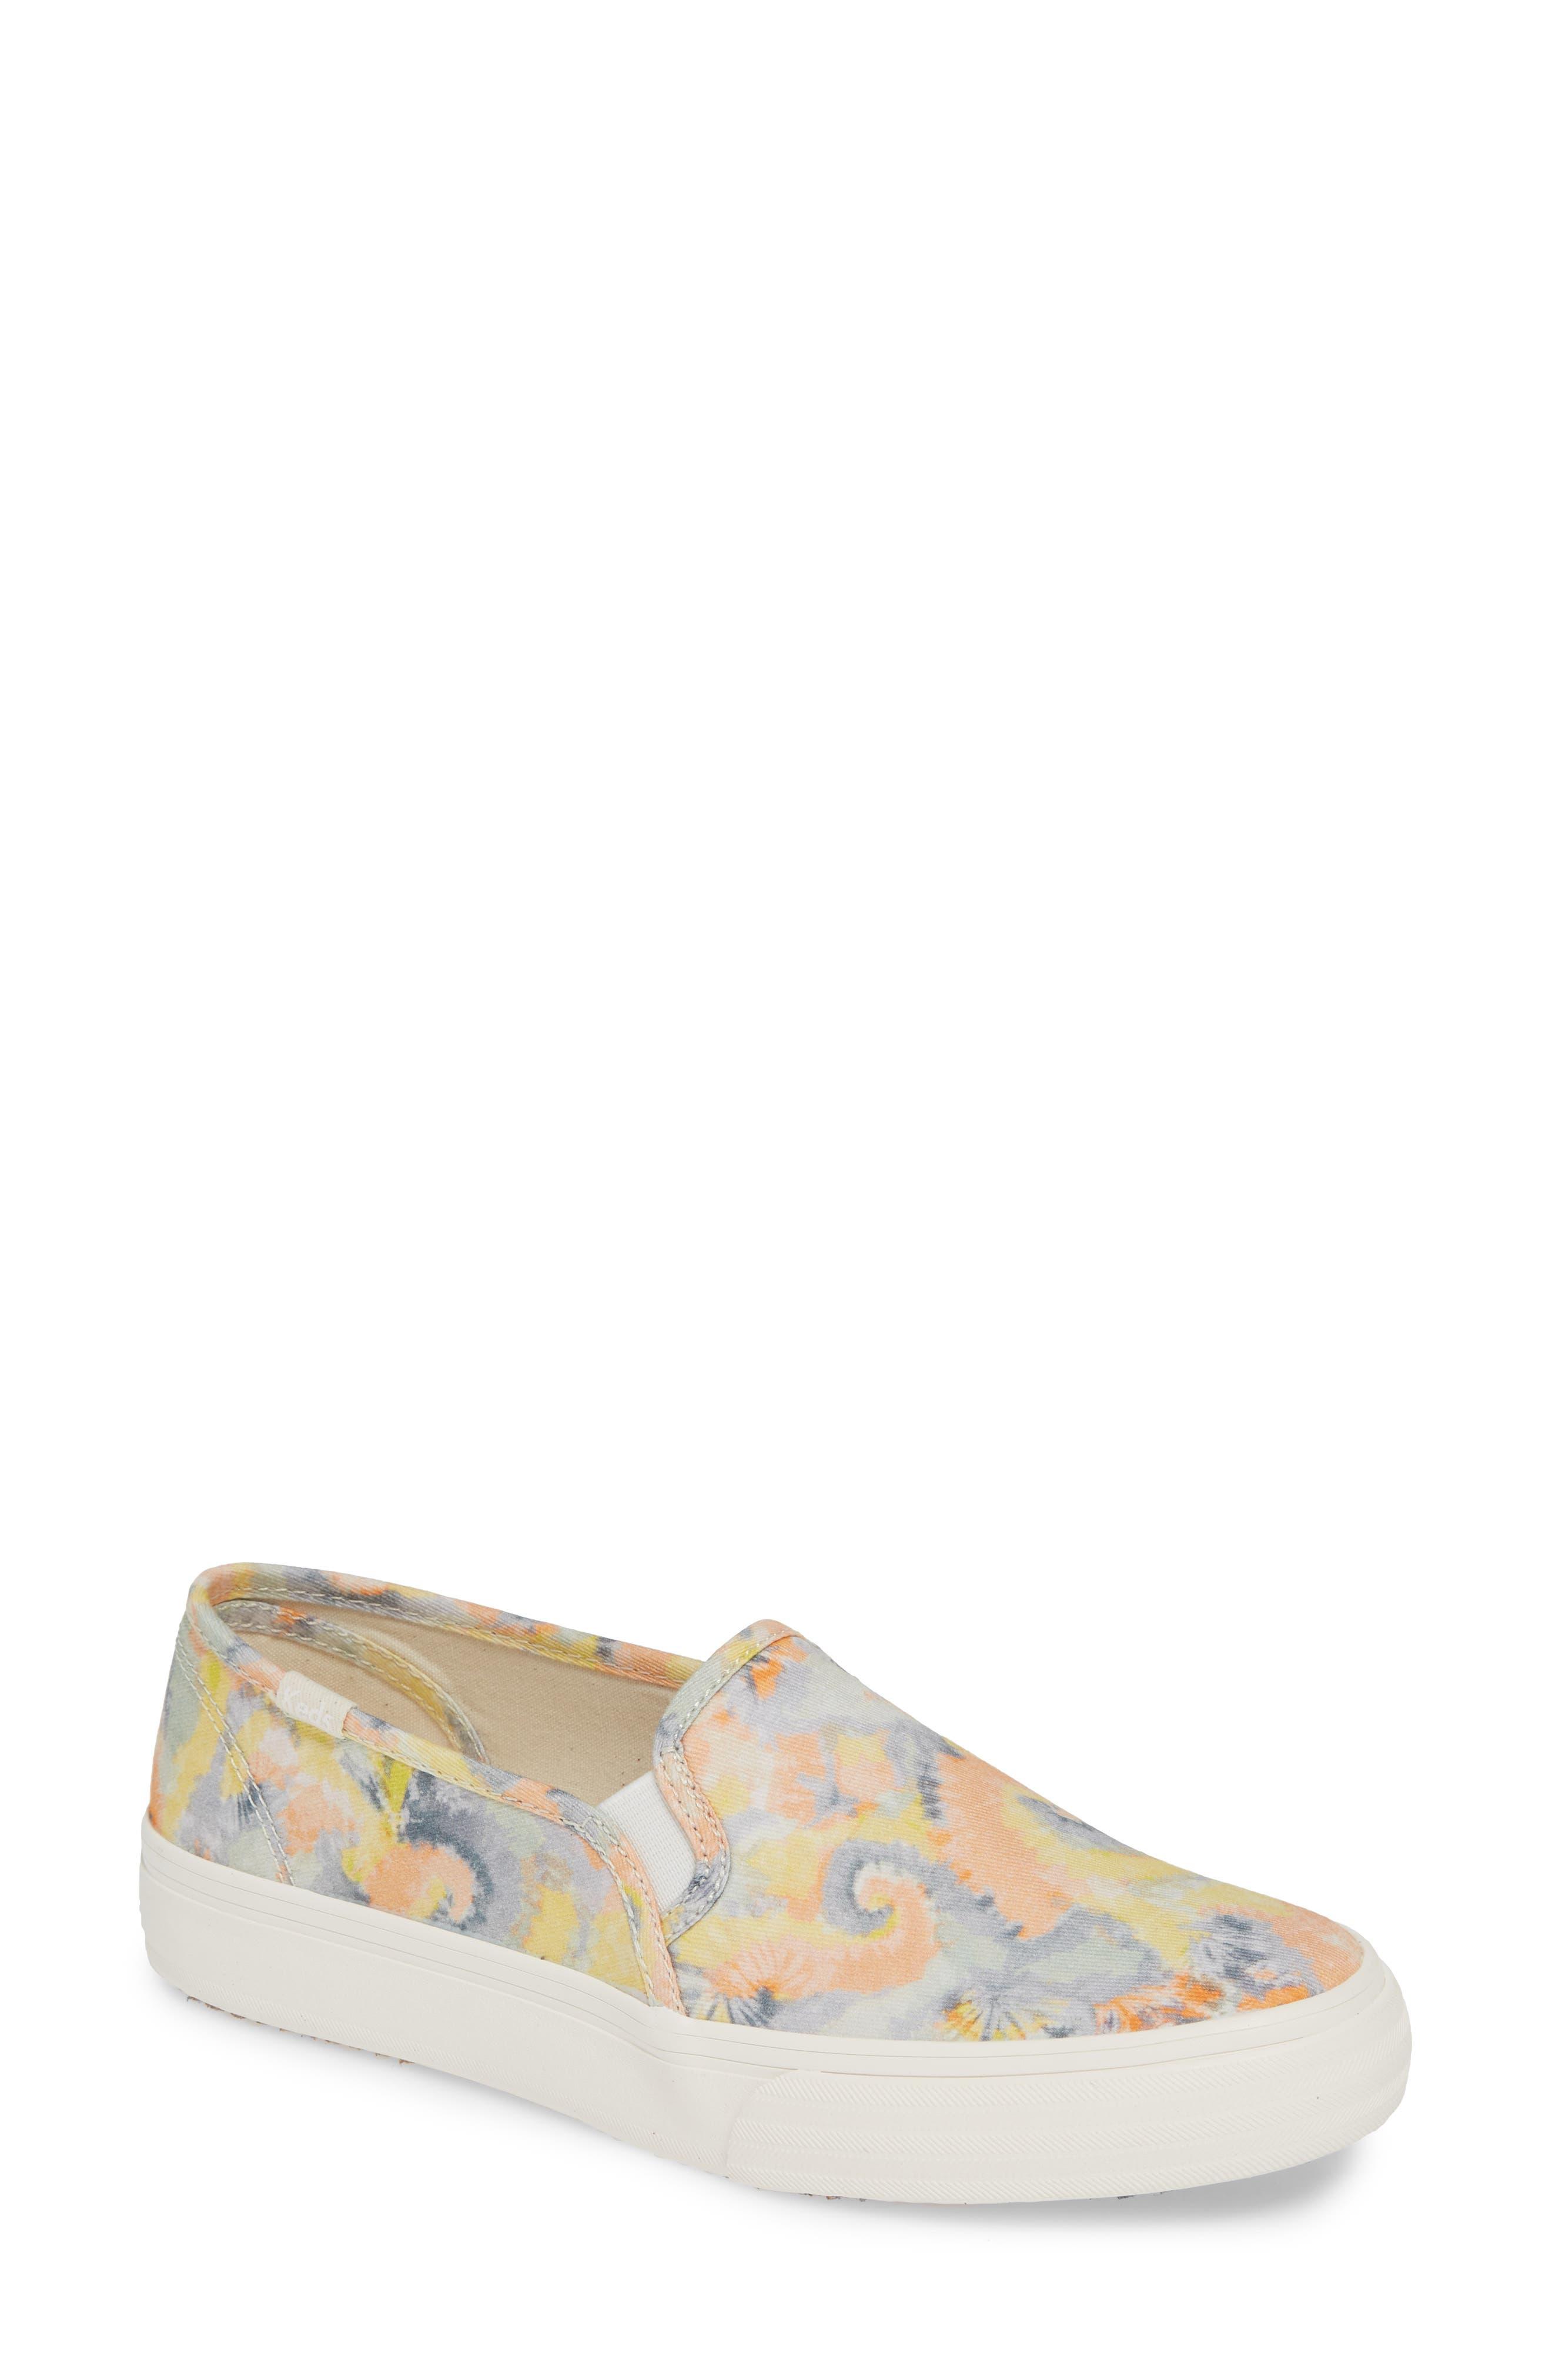 KEDS<SUP>®</SUP>, Double Decker Tie Dye Sneaker, Main thumbnail 1, color, PINK MULTI